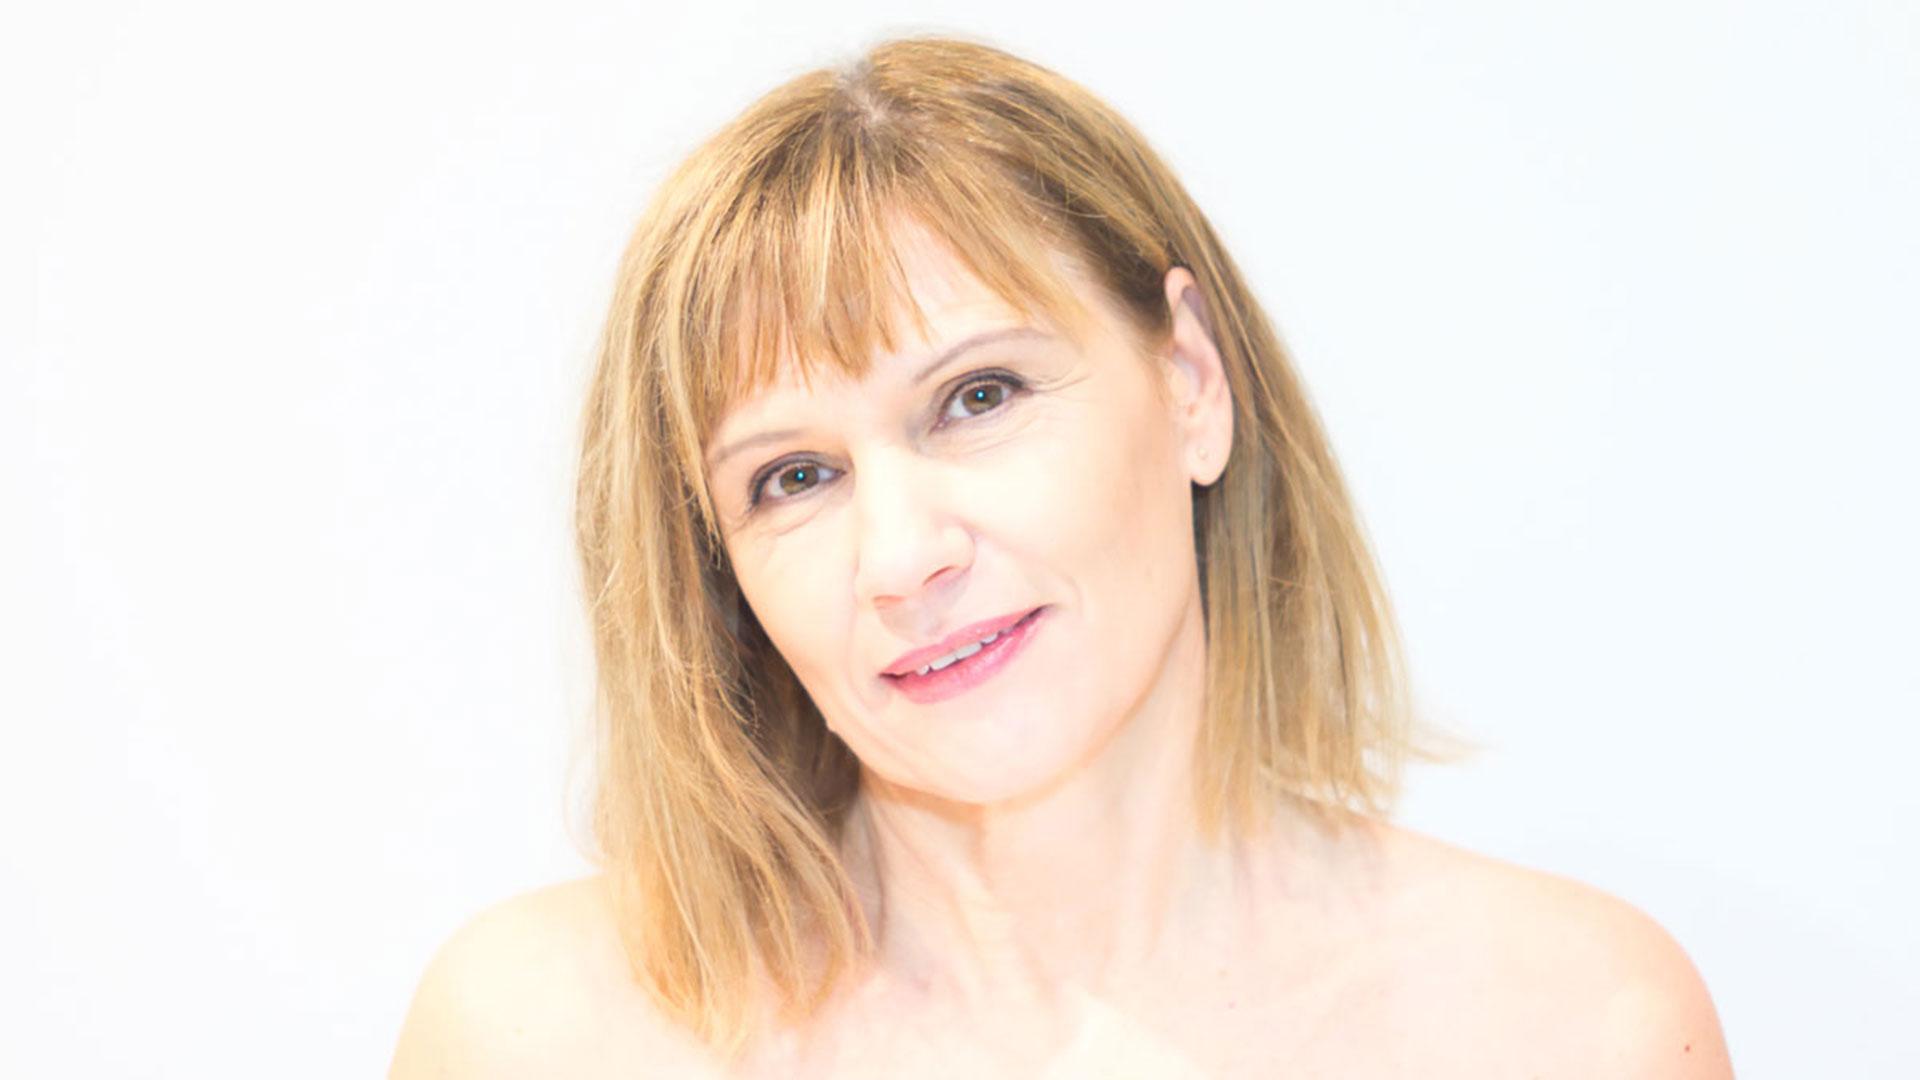 Mari Rantasila by Jouni Aslak Raatikainen